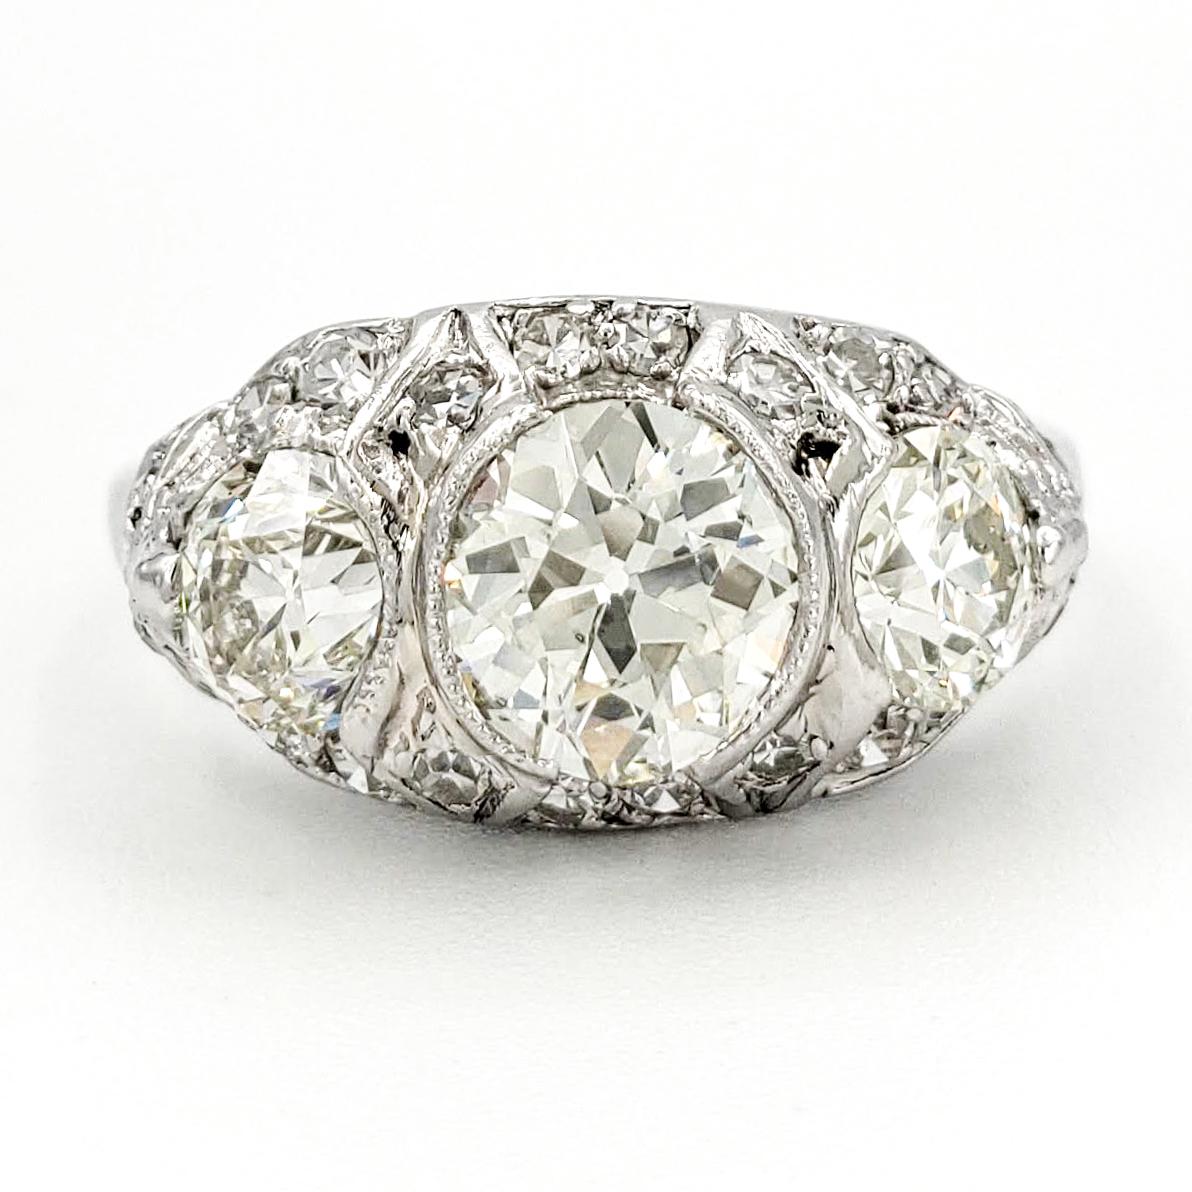 vintage-platinum-engagement-ring-with-1-01-carat-old-european-cut-diamond-egl-j-si1